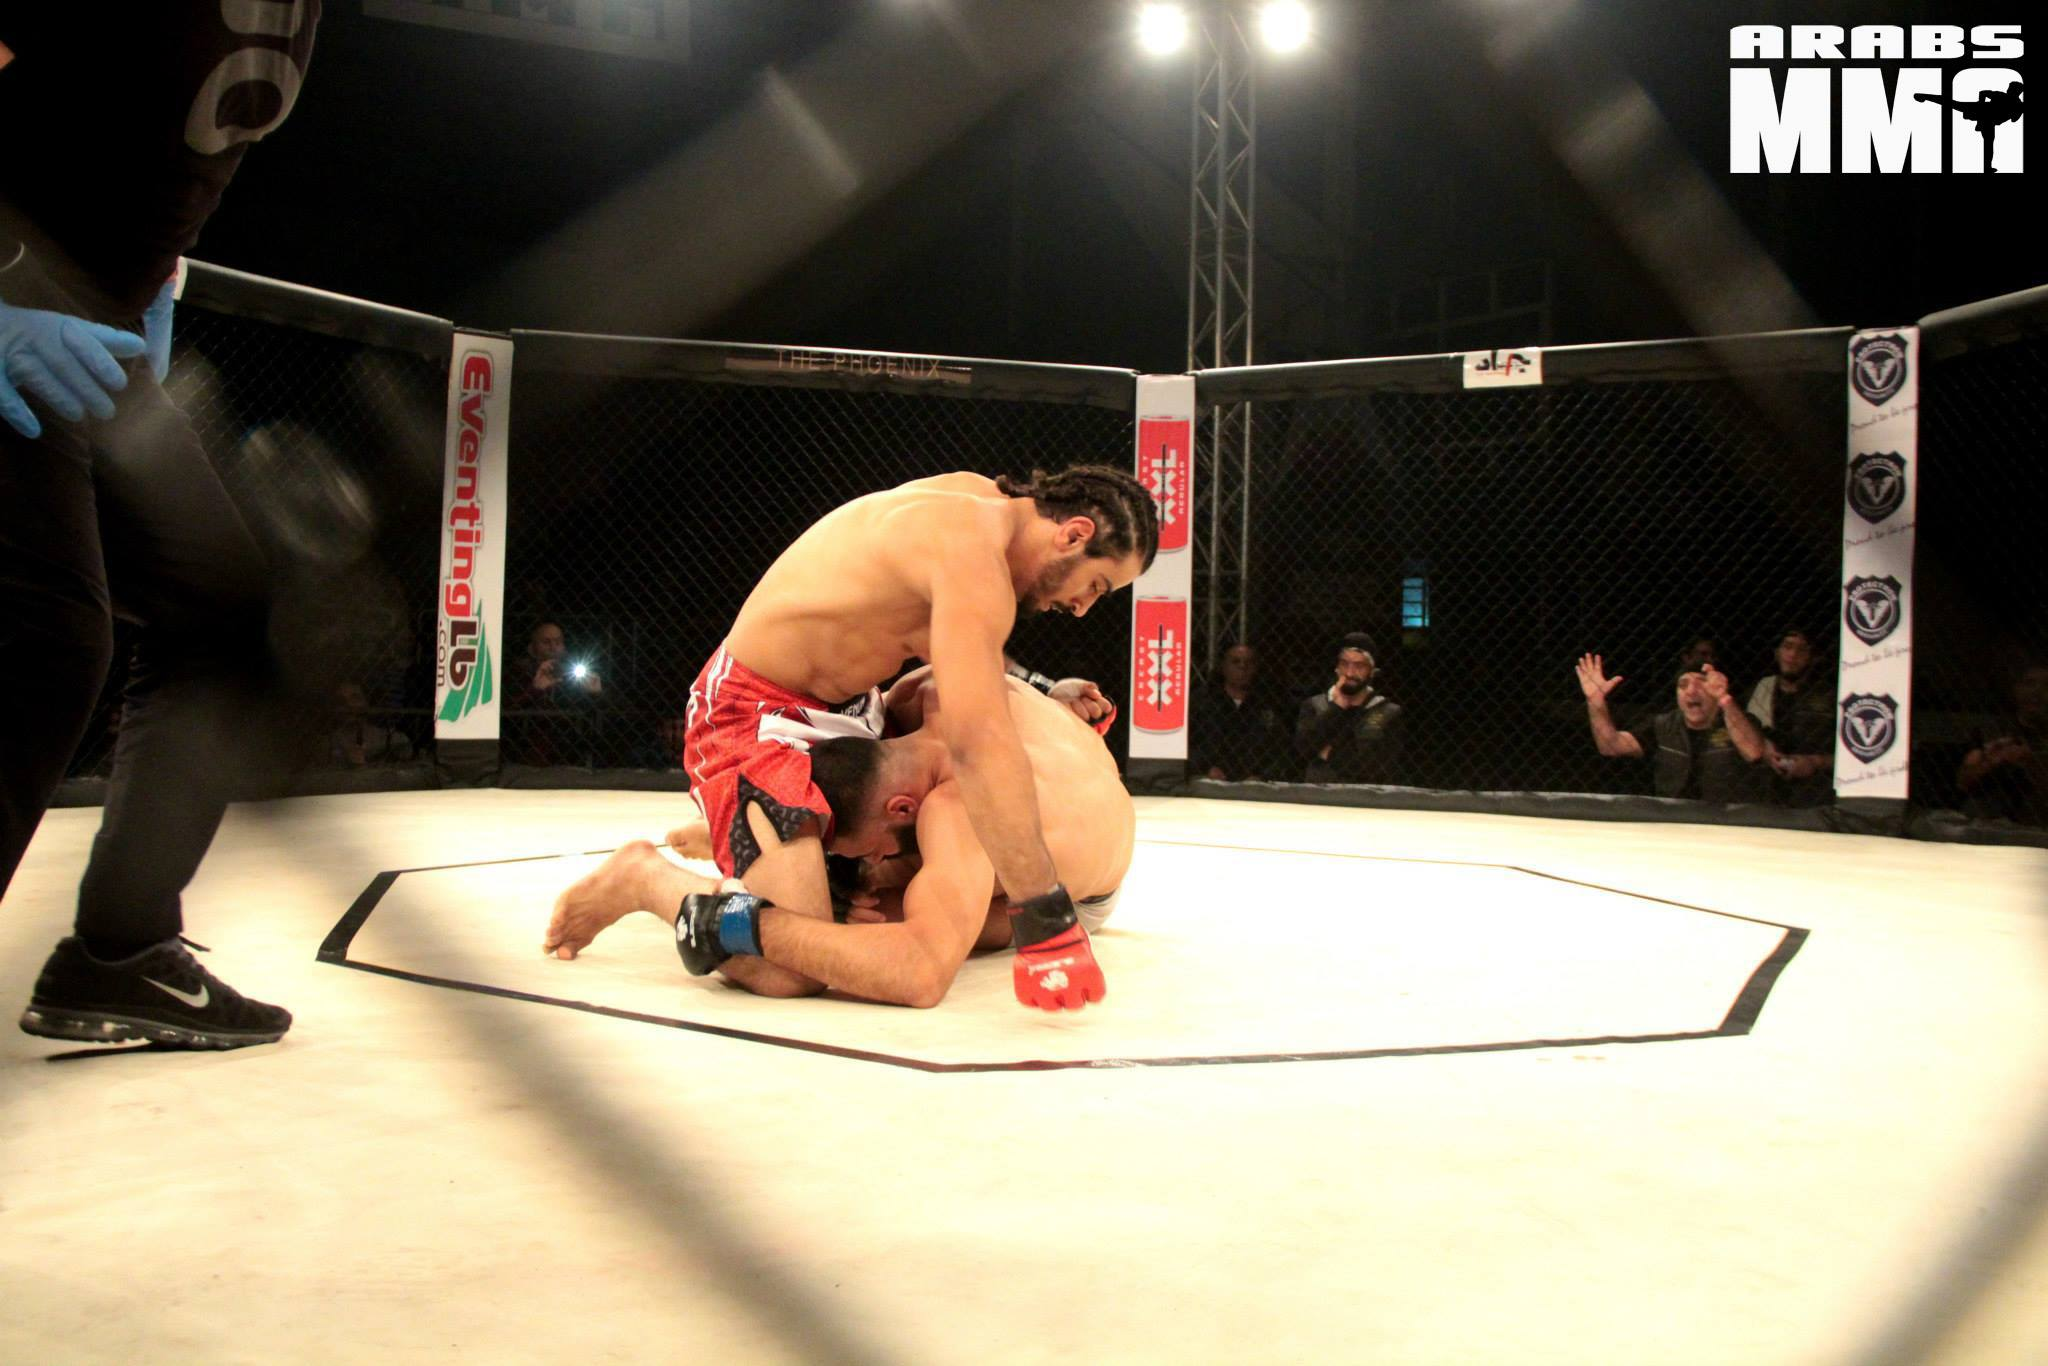 Phoenix MMA Championship Finale